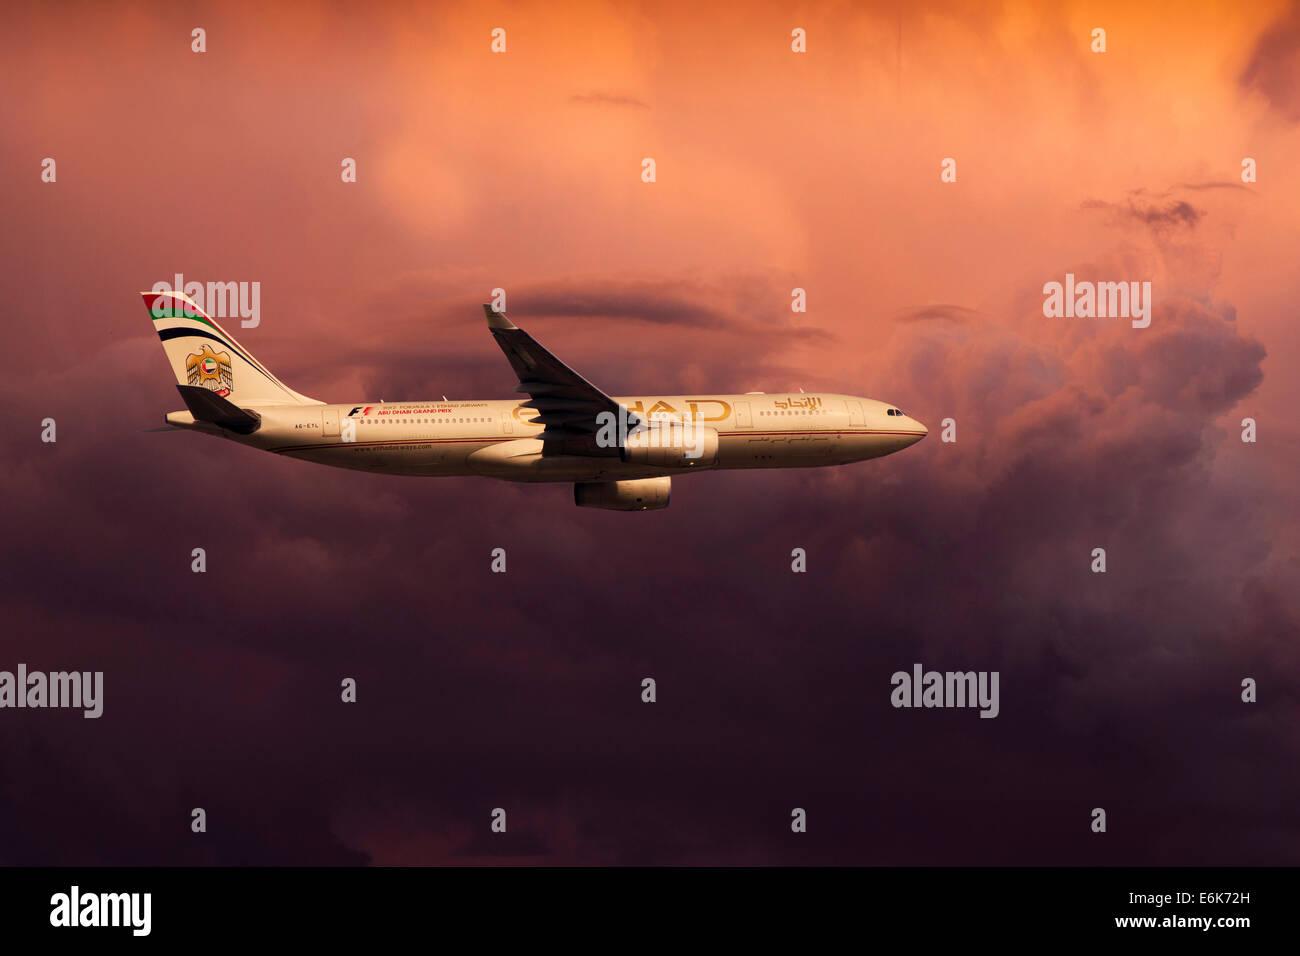 Etihad Airways, Airbus A330-243, in flight, in the evening light - Stock Image